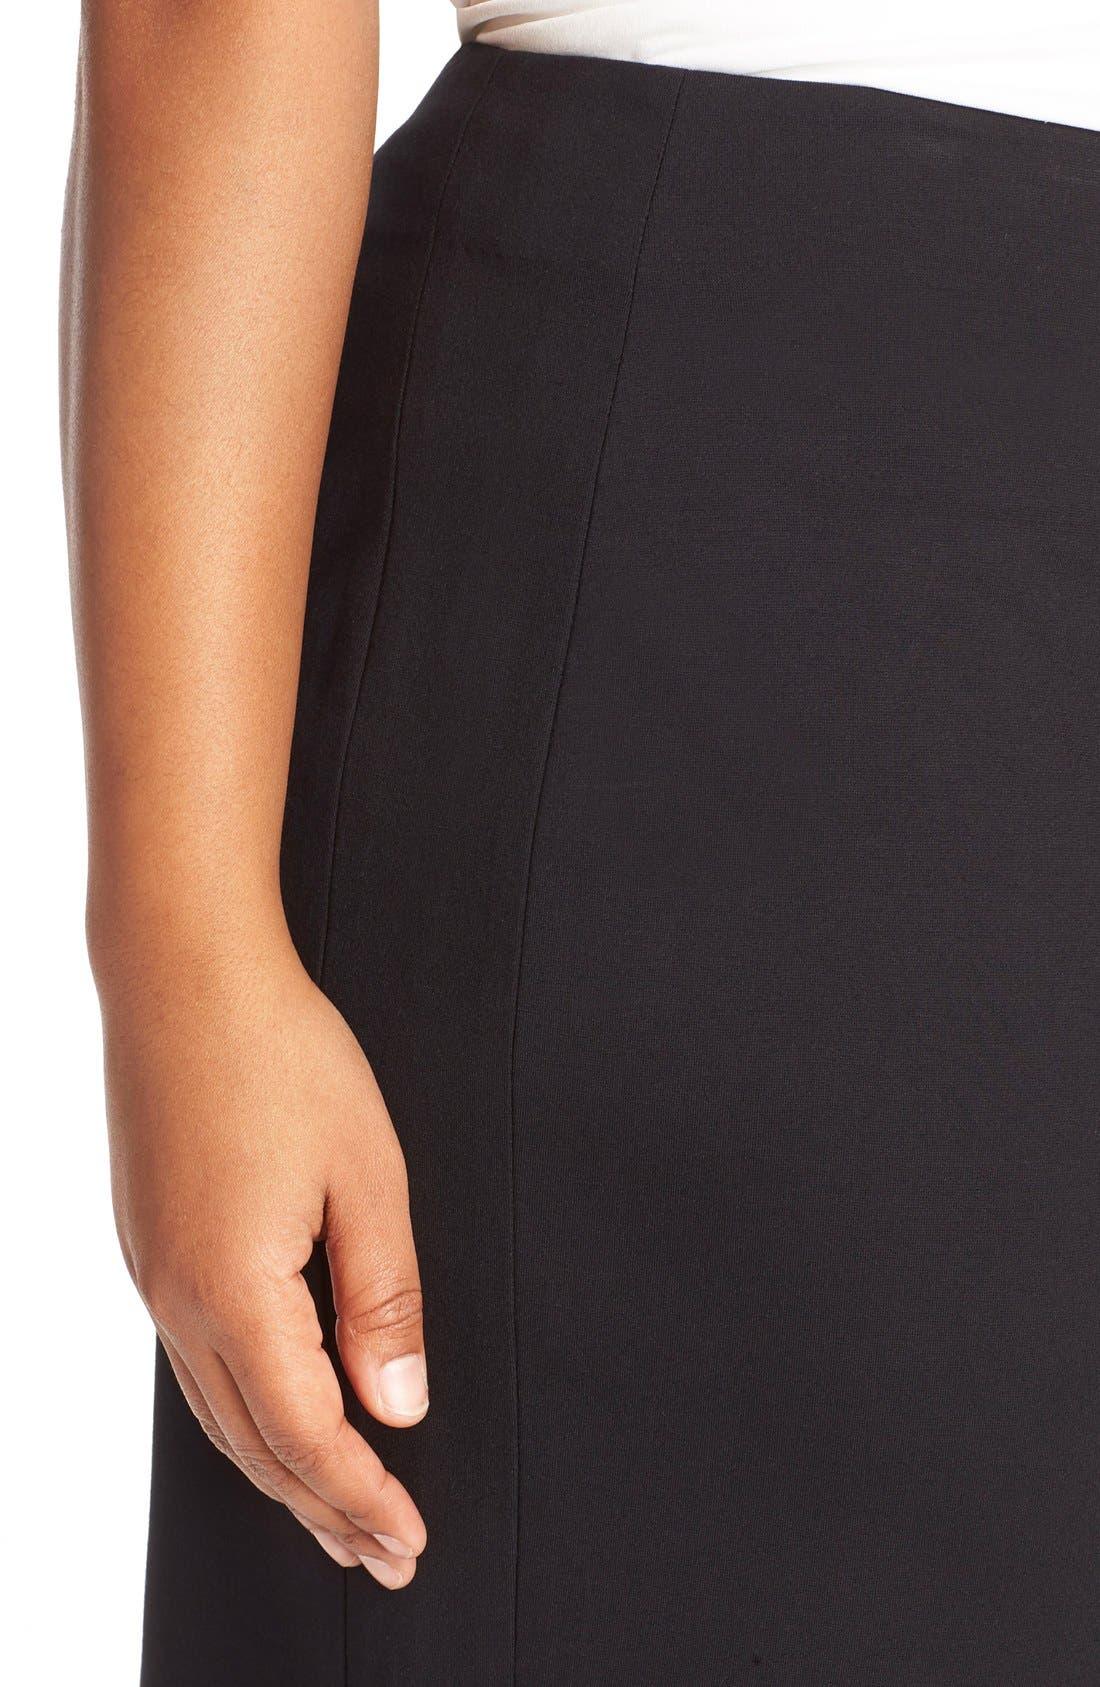 Ponte Knit Skirt,                             Alternate thumbnail 3, color,                             RICH BLACK